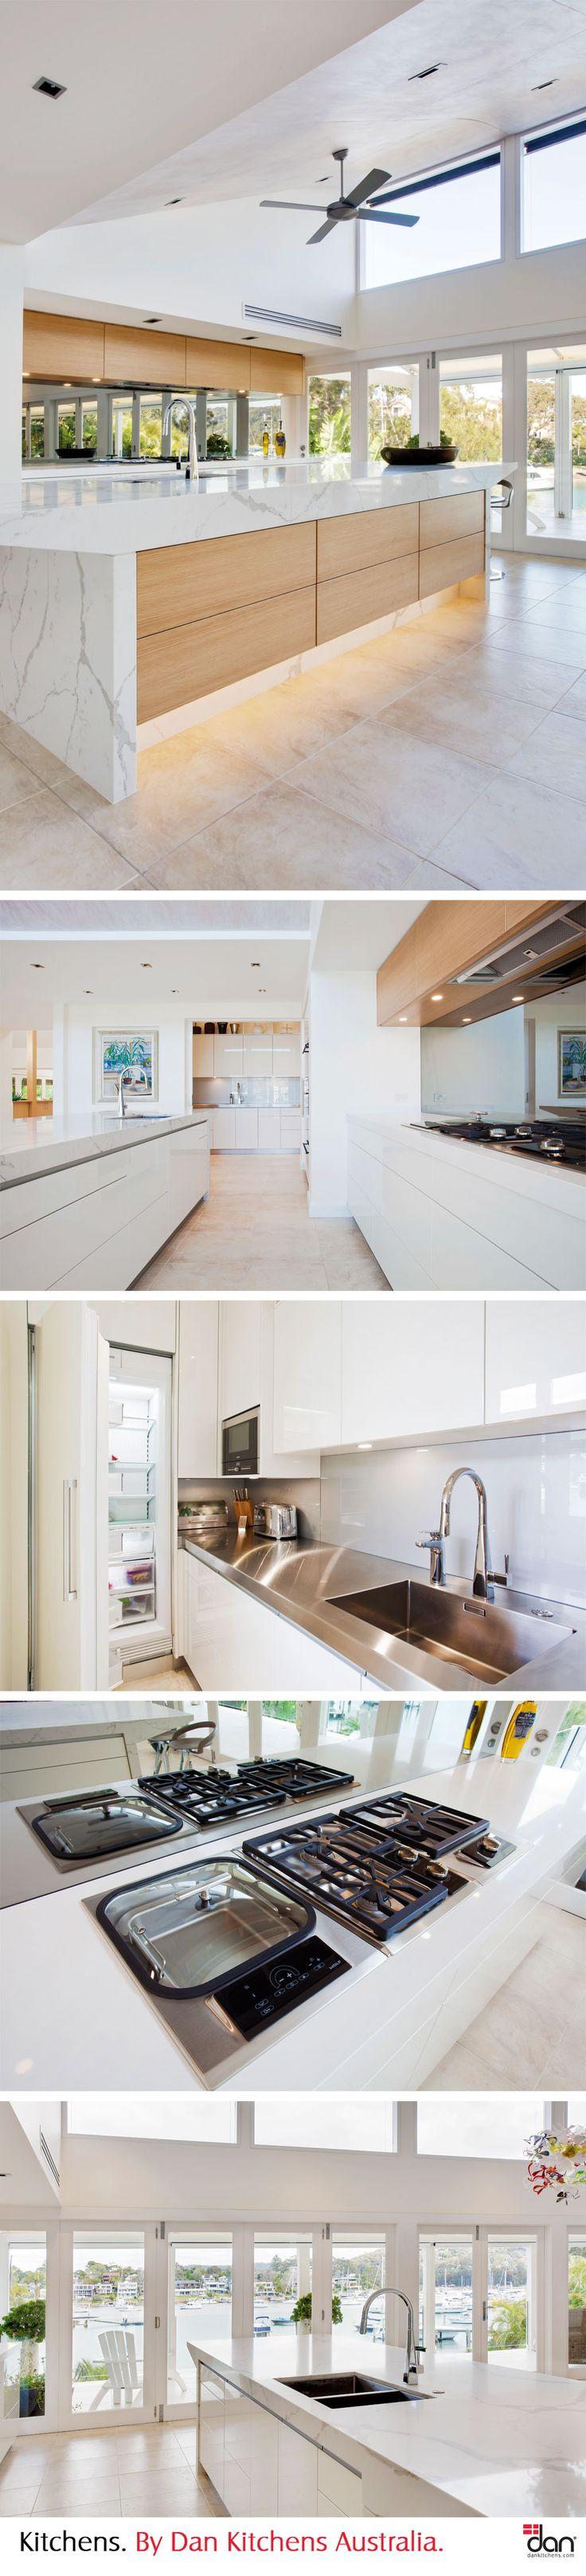 20 best Kitchens. By Dan Kitchens. images on Pinterest | Kitchen ...